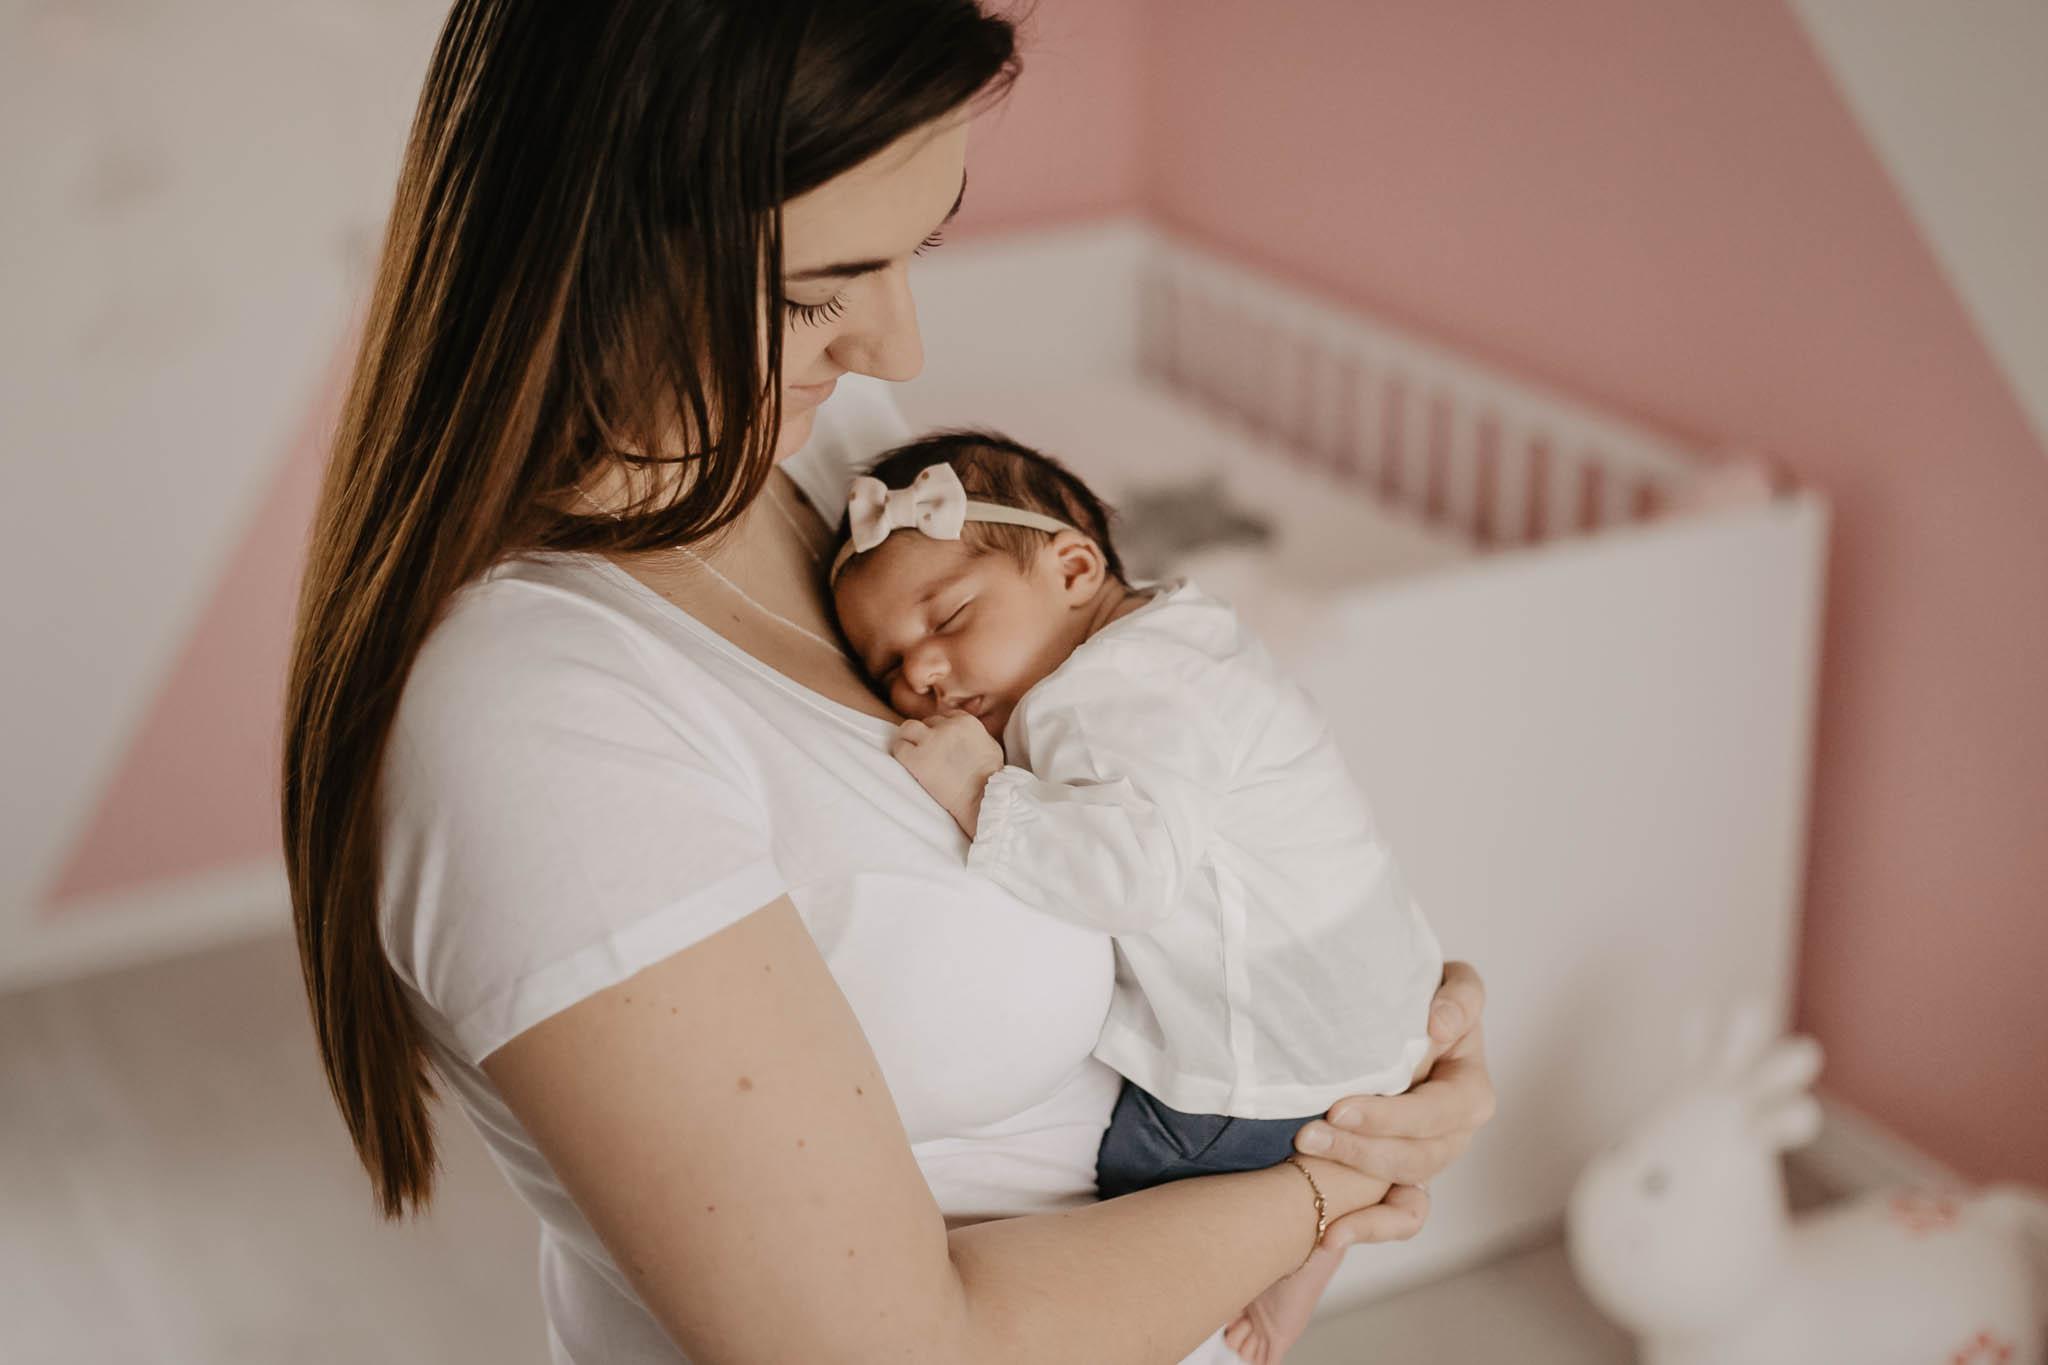 bébé-domicile-rhone-ingold-29.jpg